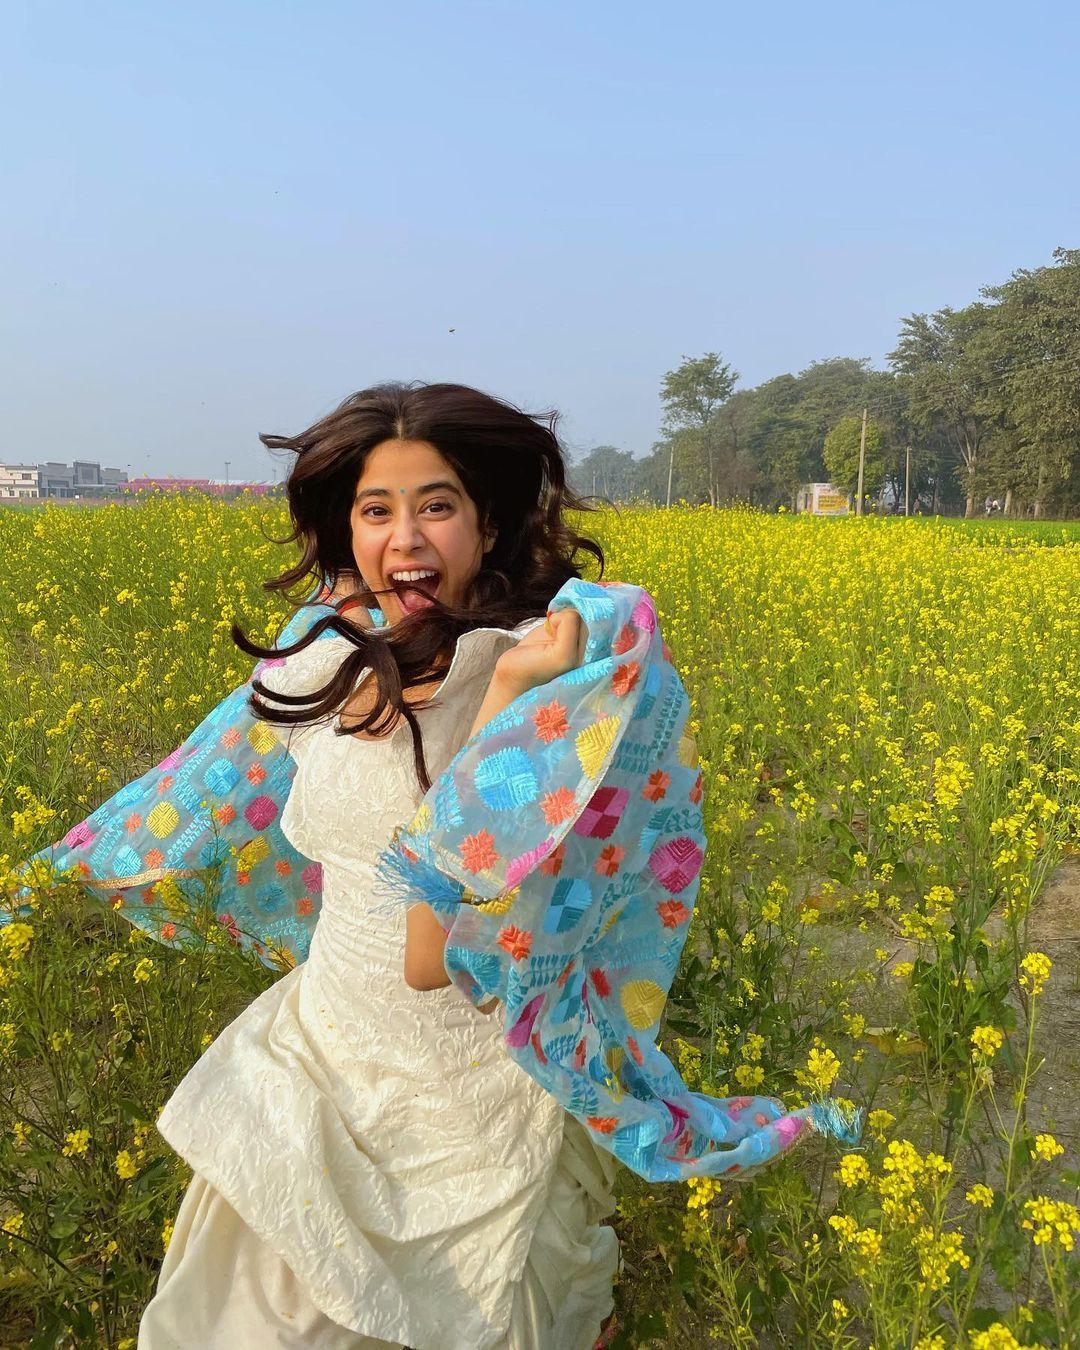 Janhvi Kapoor : పూల తోట మధ్యలో దేవకన్యలా జాన్వీ కపూర్. Photo: Janhvi Kapoor Instagram